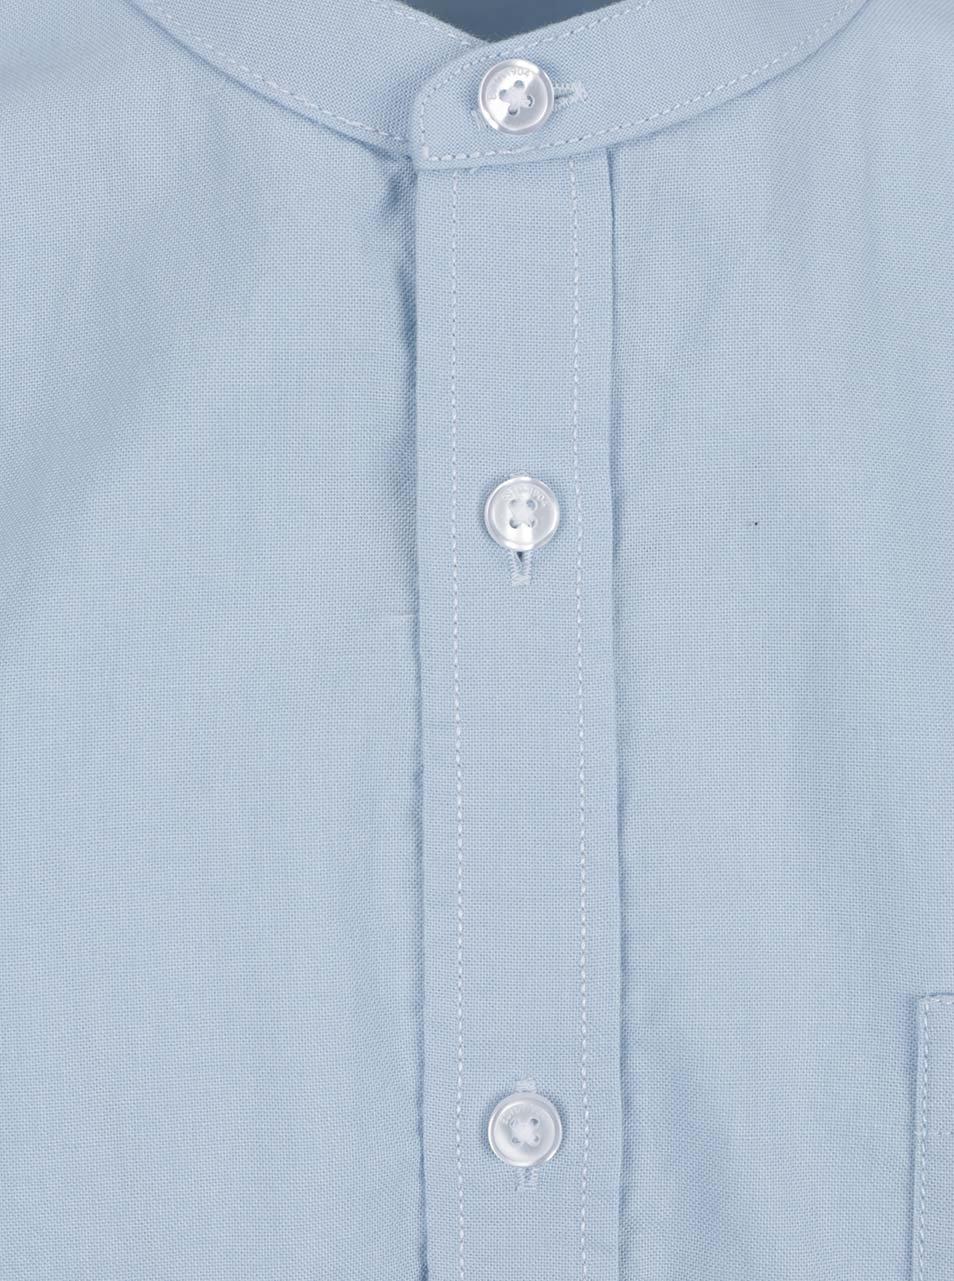 33491f5c4529 Svetlomodrá košeľa bez goliera Burton Menswear London ...